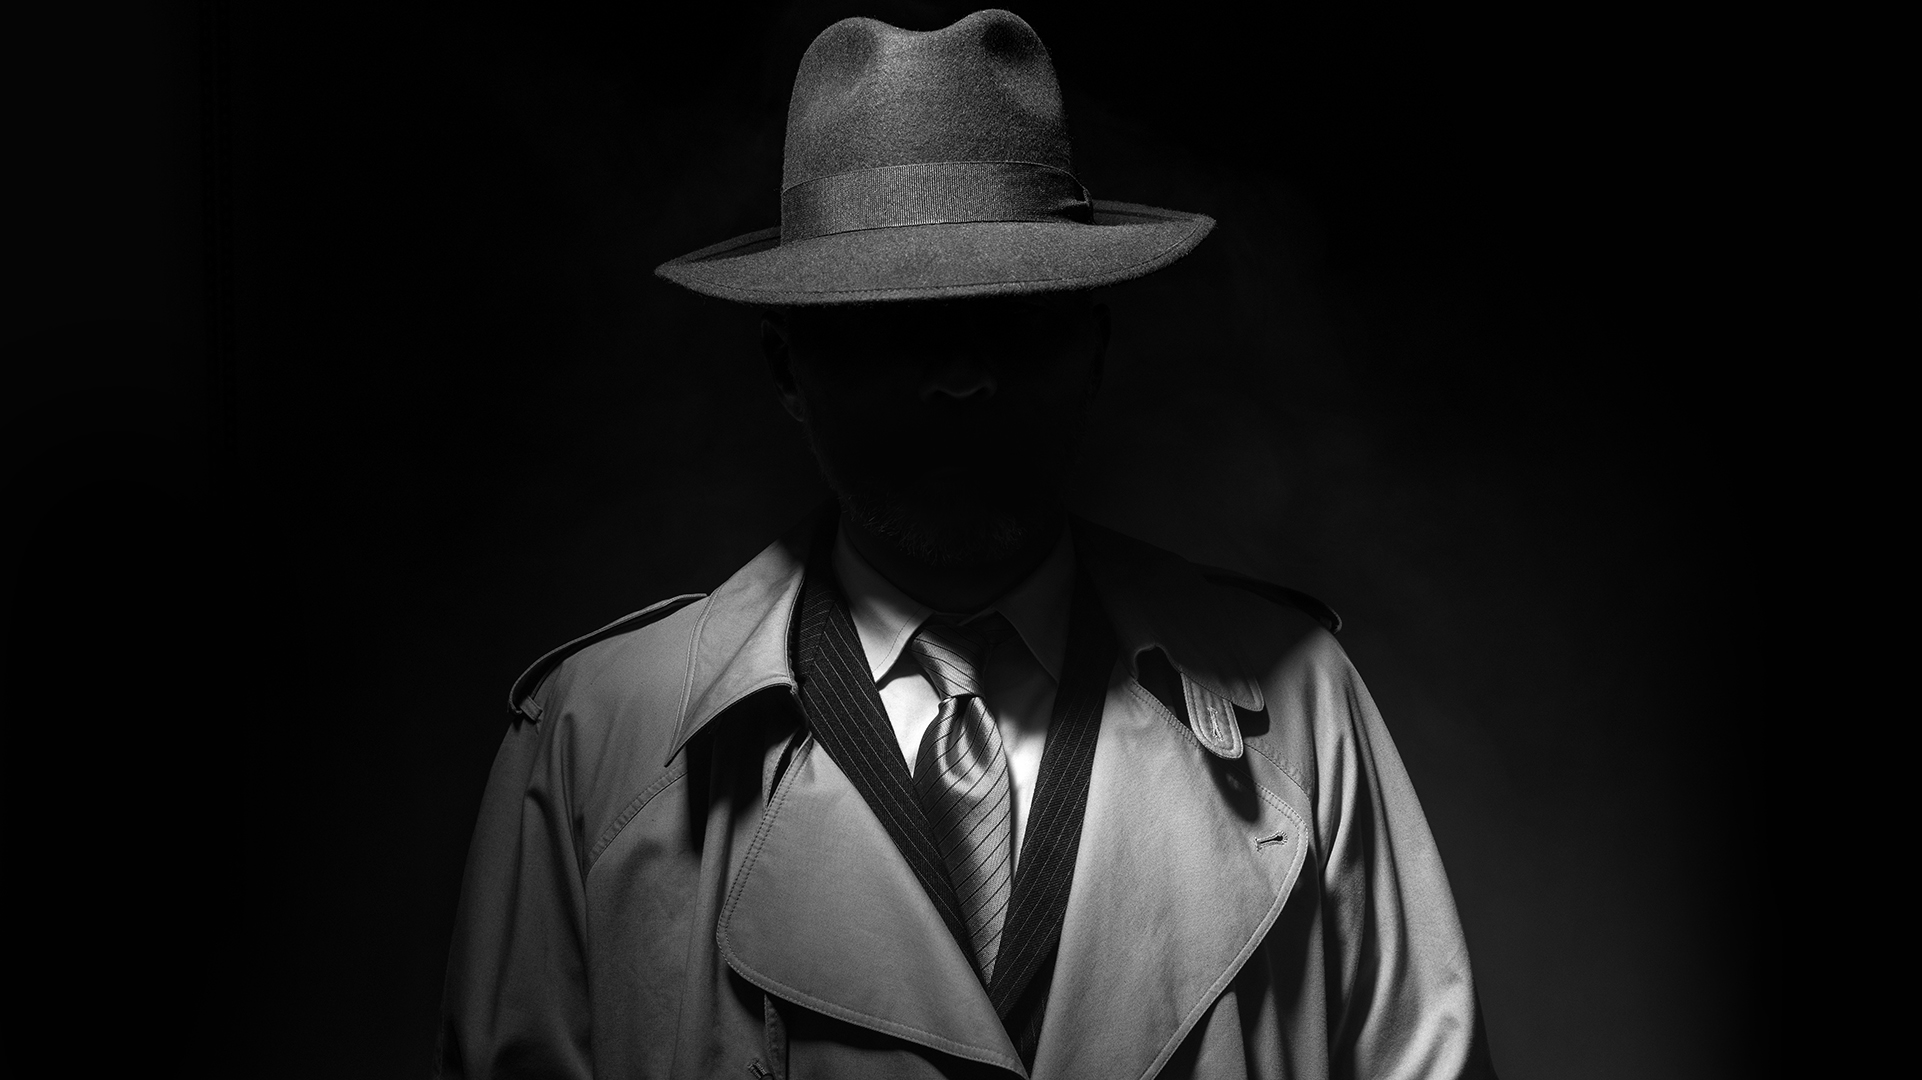 Зрадник держави: волинянина судитимуть за шпигунство